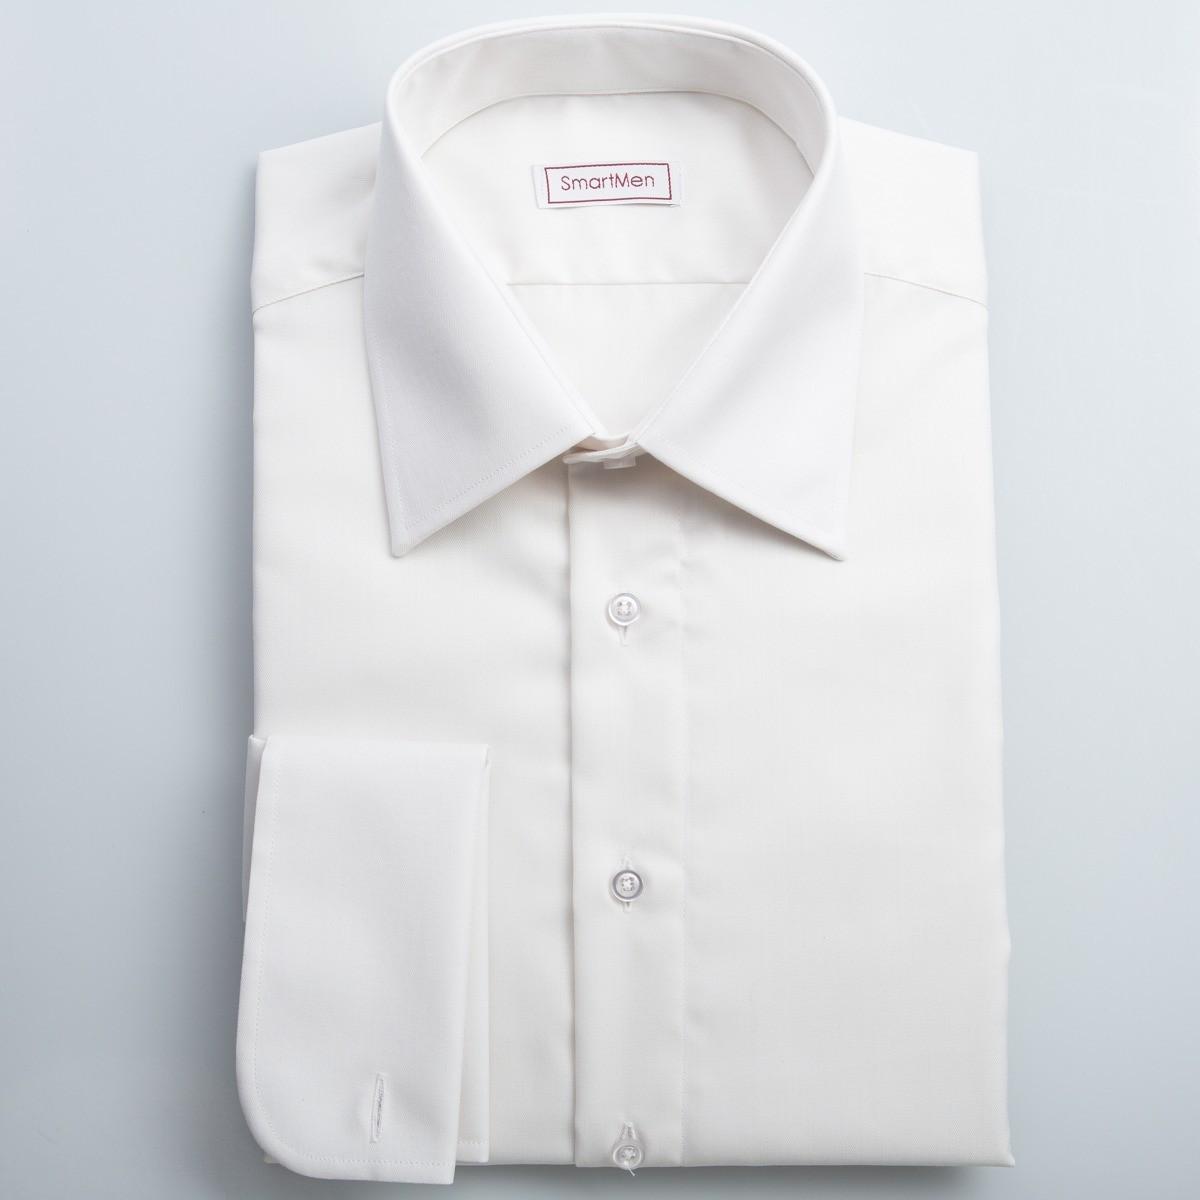 f97b146875e7 Svadobná manžetová košeľa smetanová SmartMen